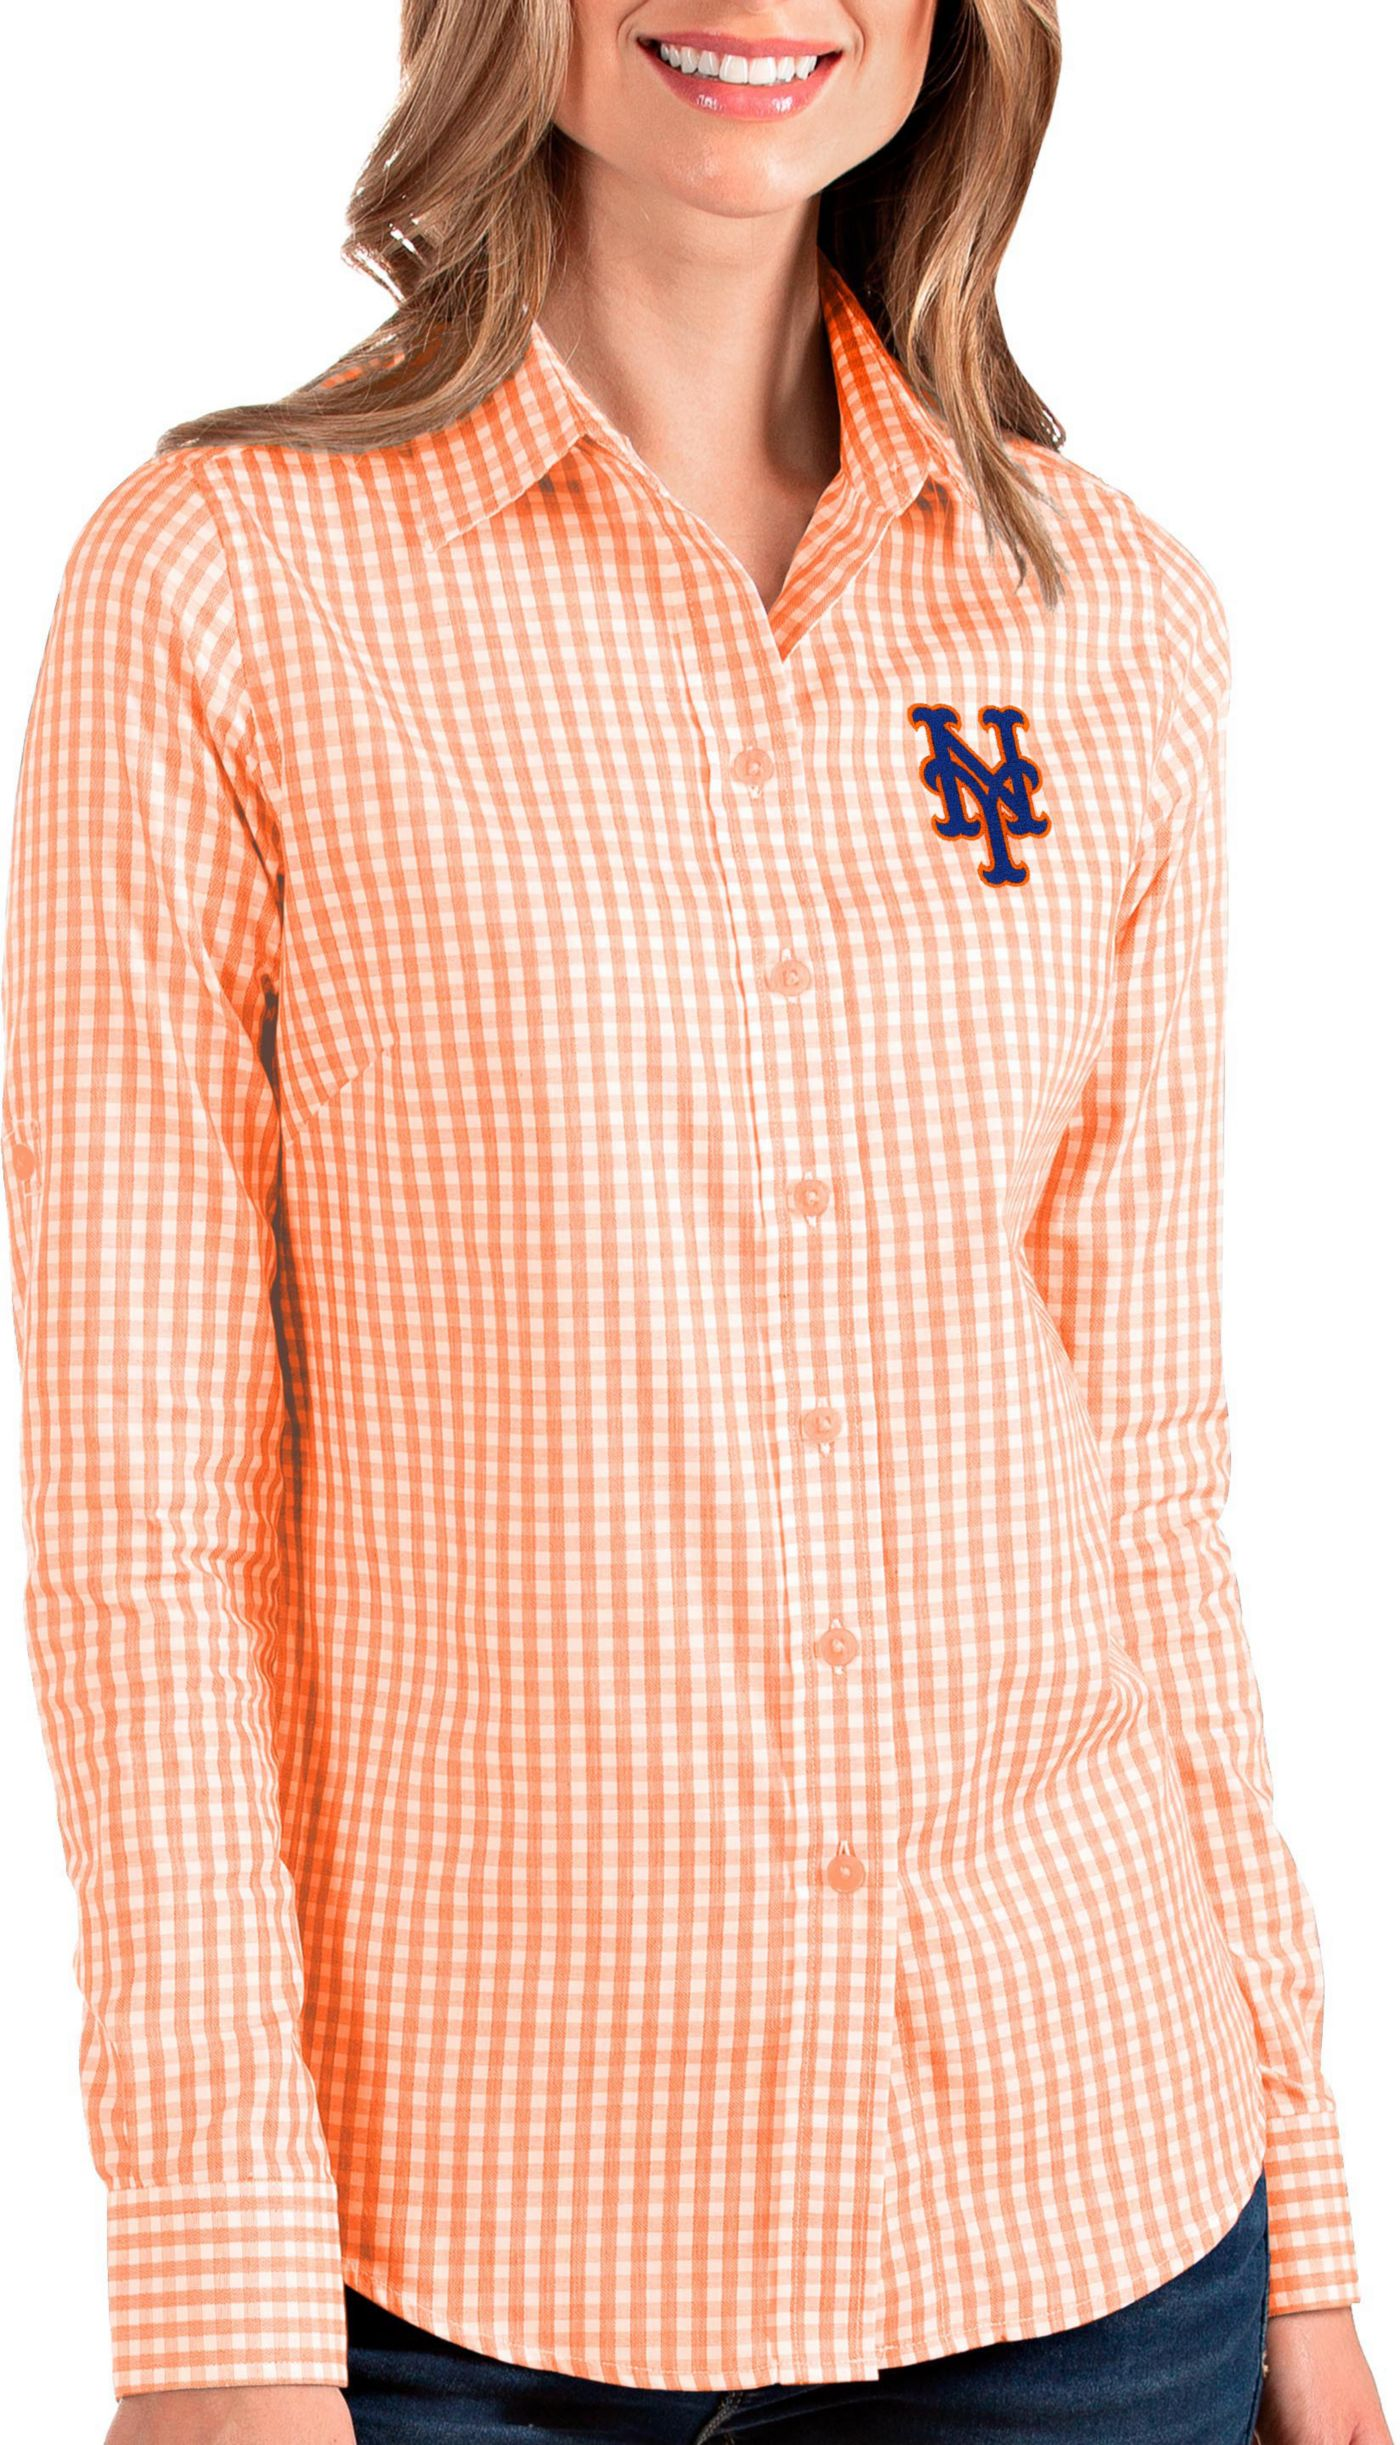 Antigua Women's New York Mets Structure Button-Up Orange Long Sleeve Shirt